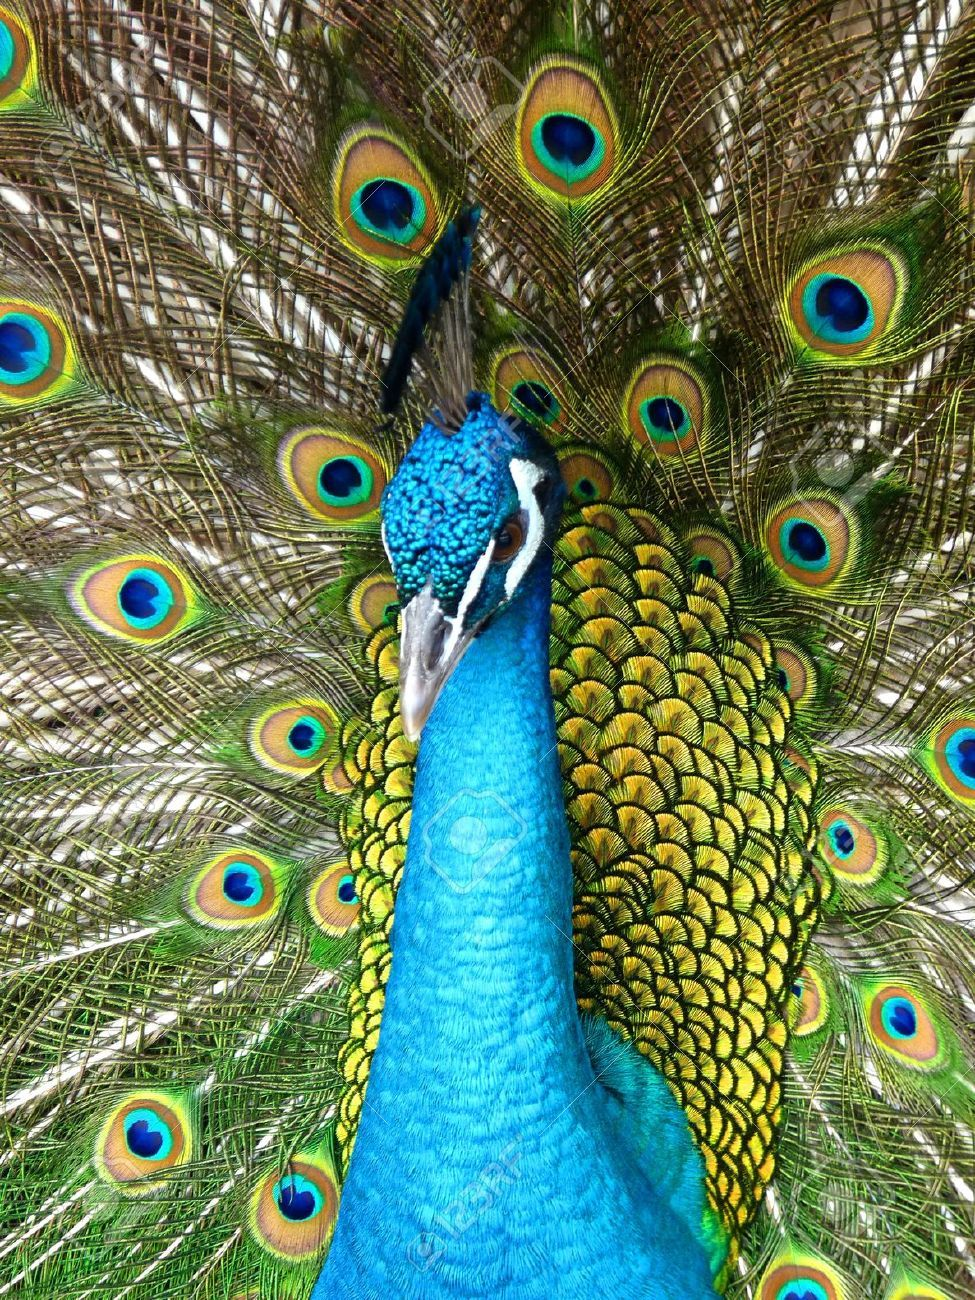 Proud Peacock With Open Feathers Peacock Peacock Bird Bird